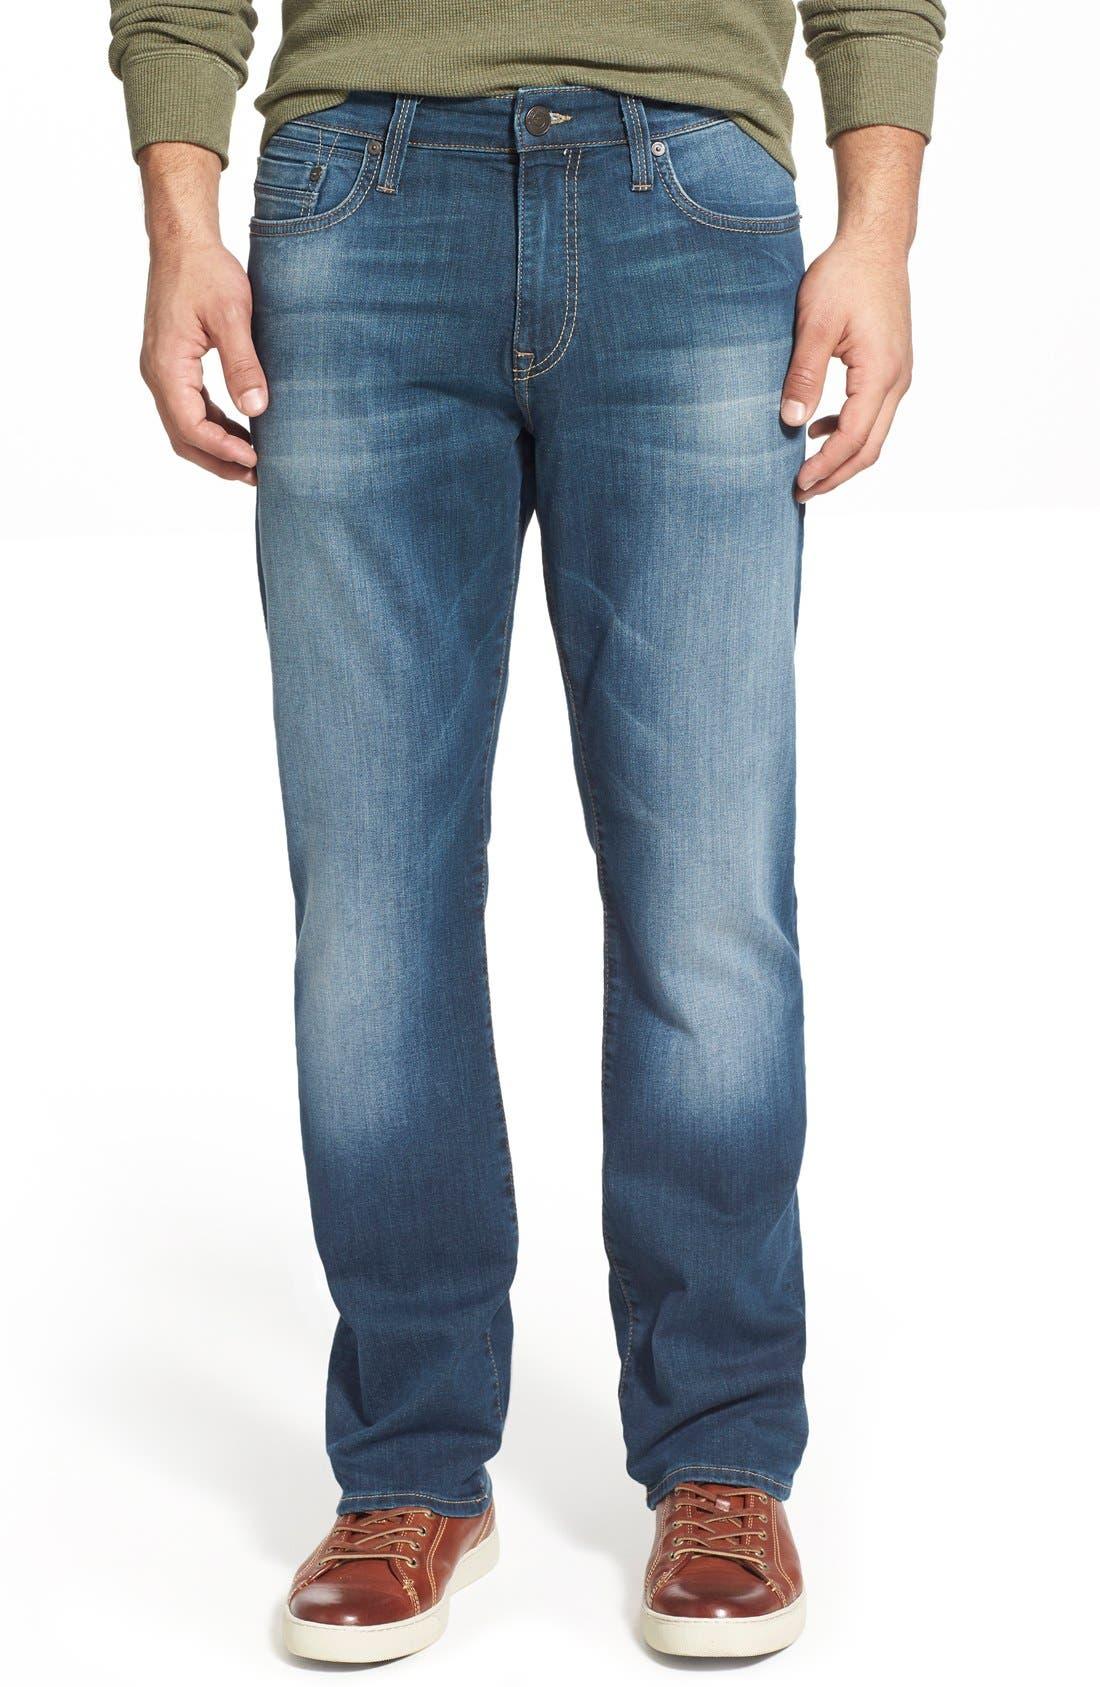 Myles Straight Leg Jeans,                         Main,                         color, SHADED WILLIAMSBURG